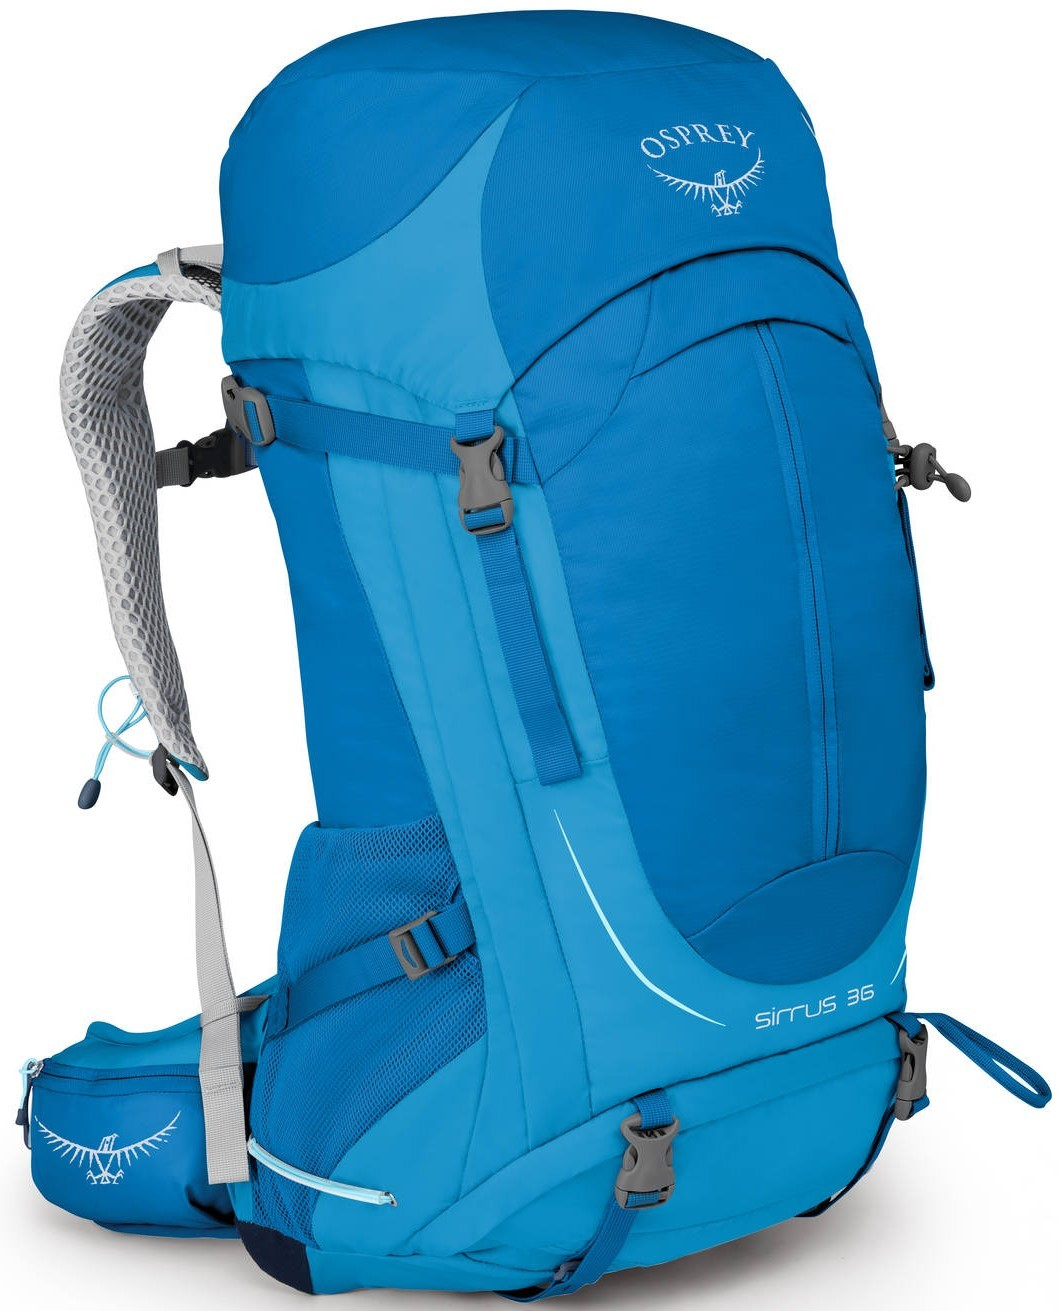 Туристические рюкзаки Рюкзак туристический женский Osprey Sirrus 36 Sirrus_36_S17_Side_Summit_Blue_web.jpg